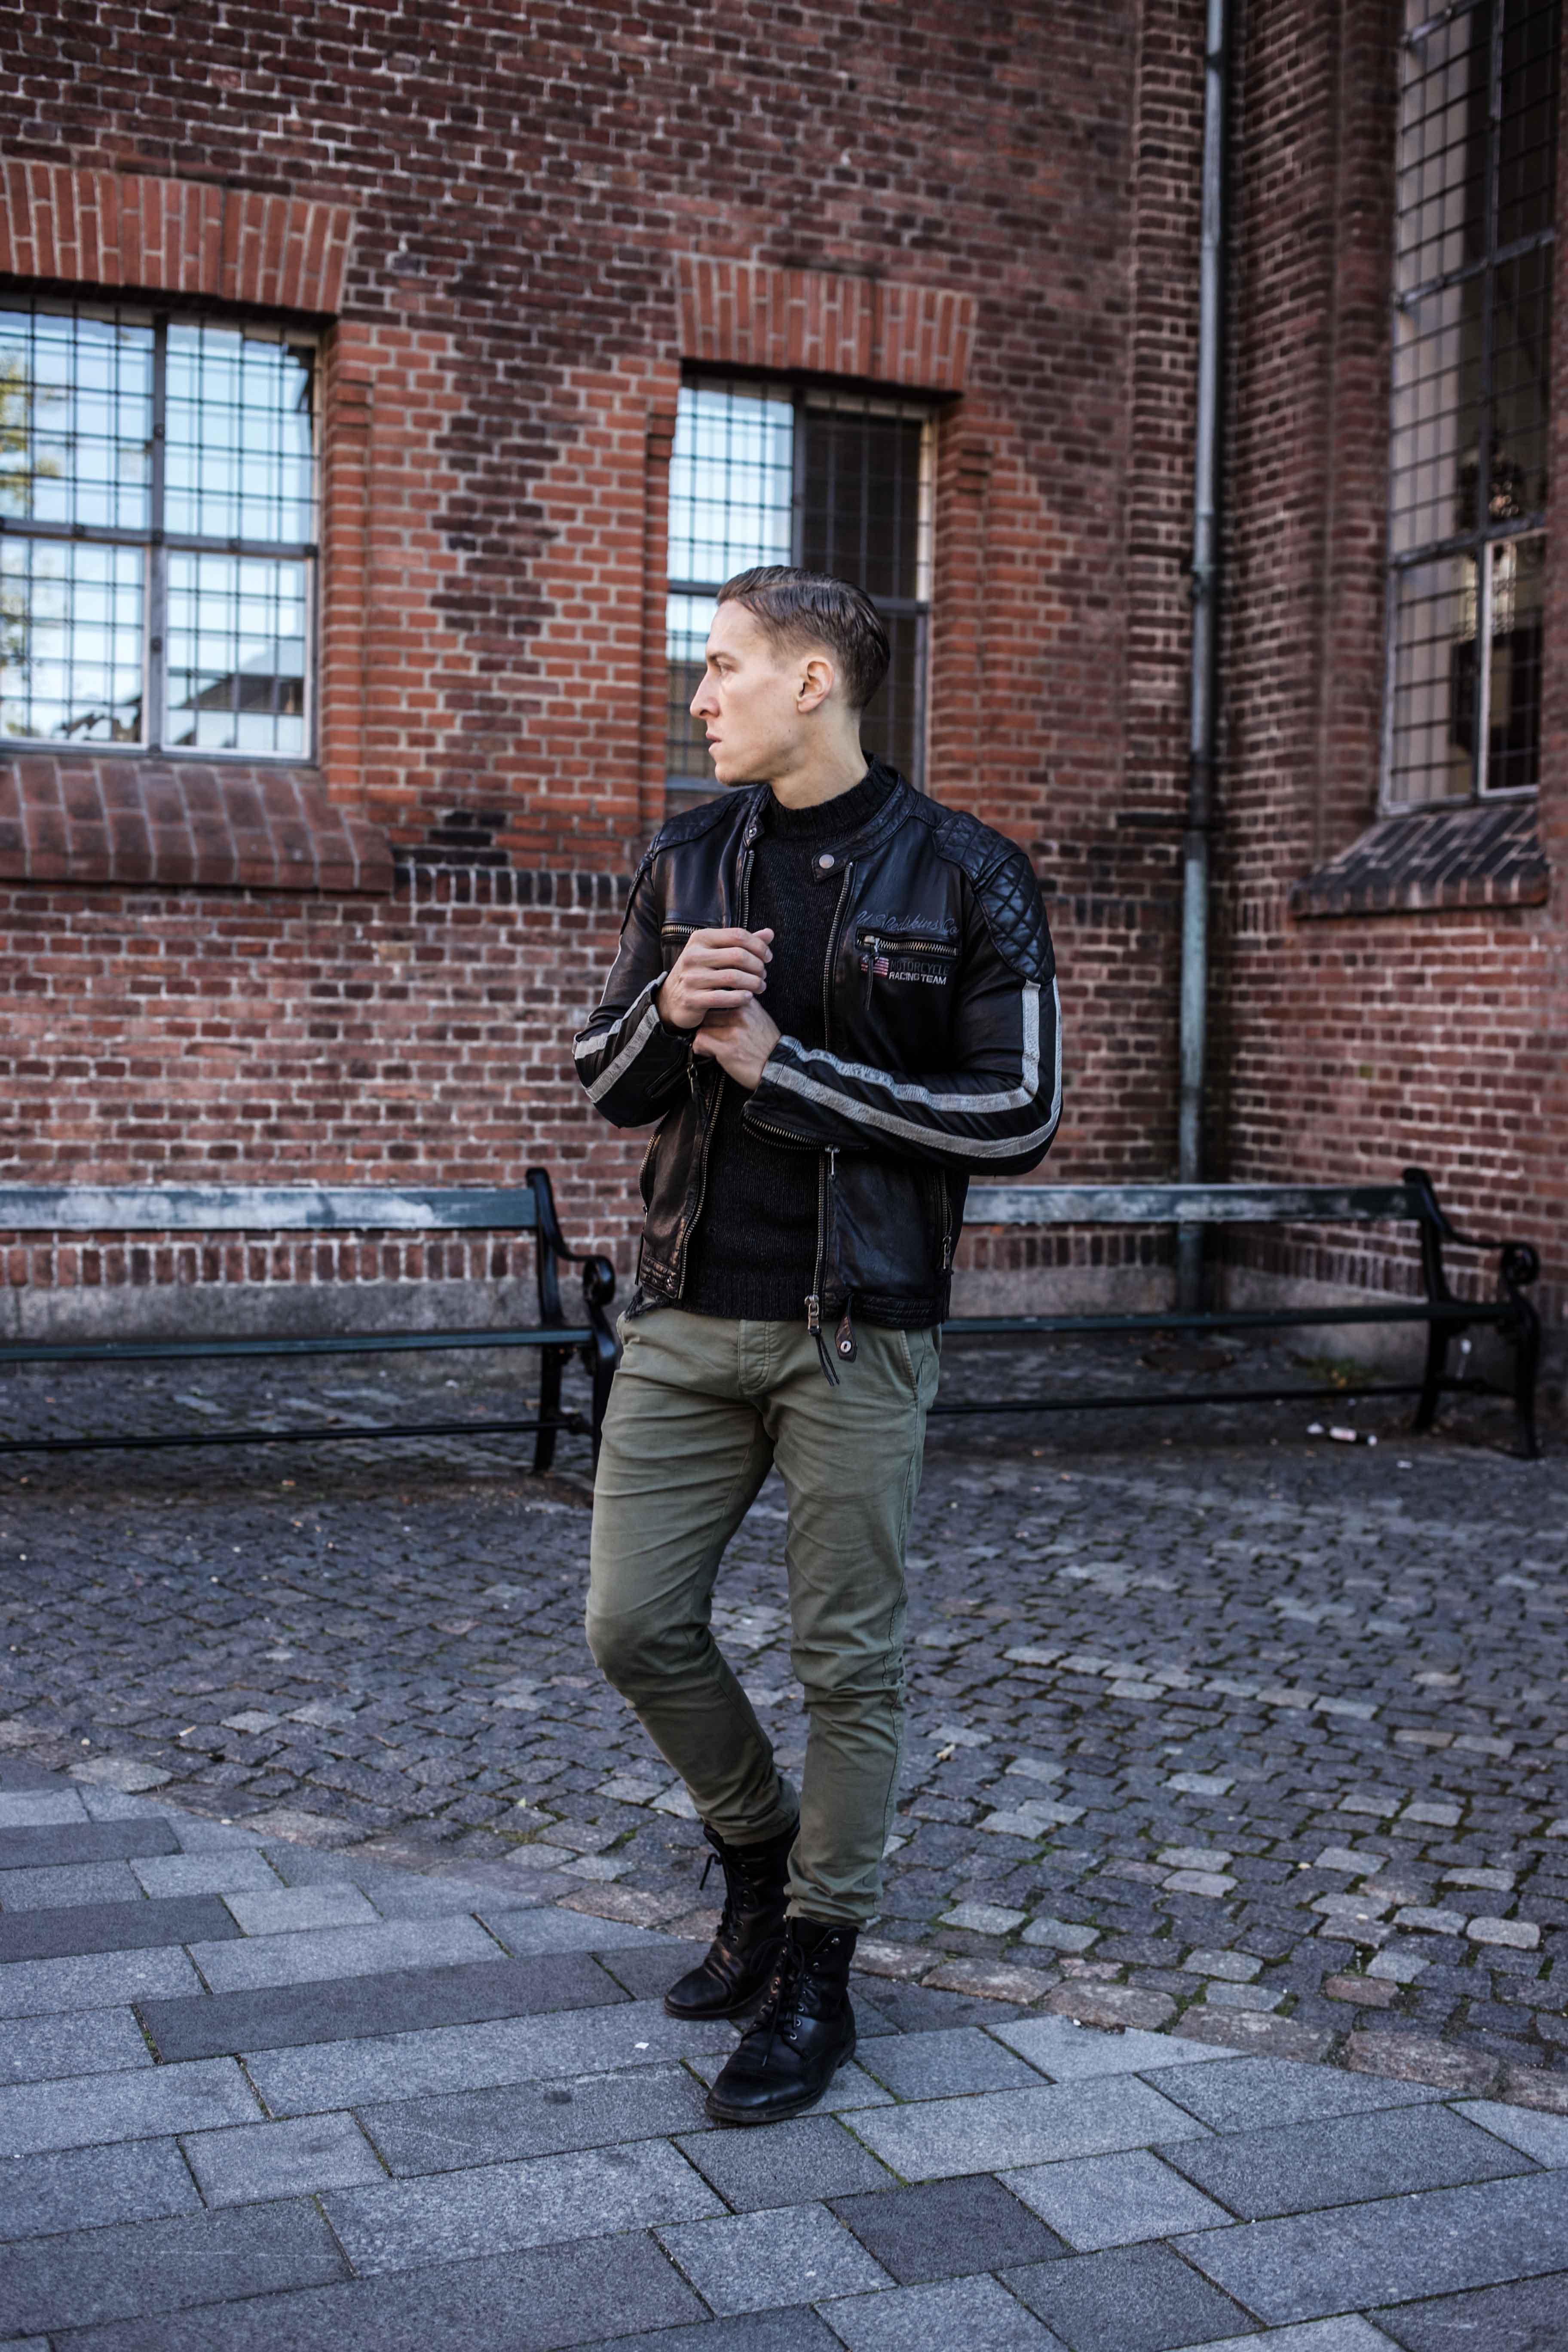 trashed-pullover-schwarze-lederjacke-olivgruene-chino-grunge-look_6020